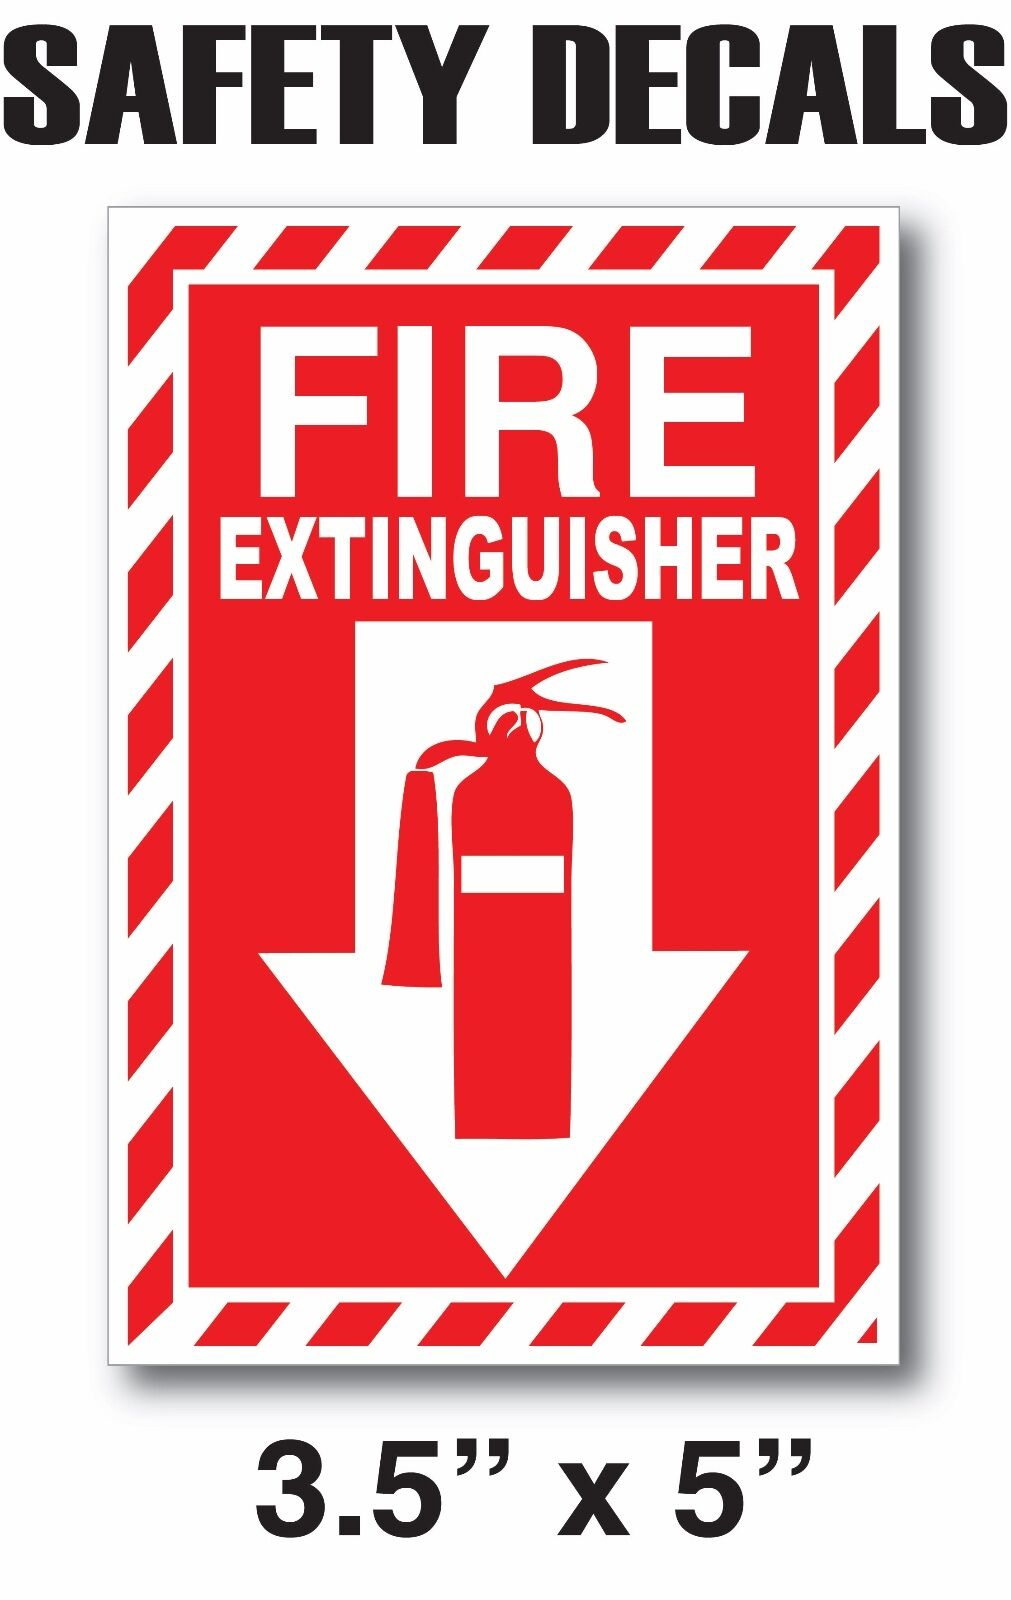 FIRE EXTINGUISHER Sticker Decals Inspection or Hose Alarm Sm